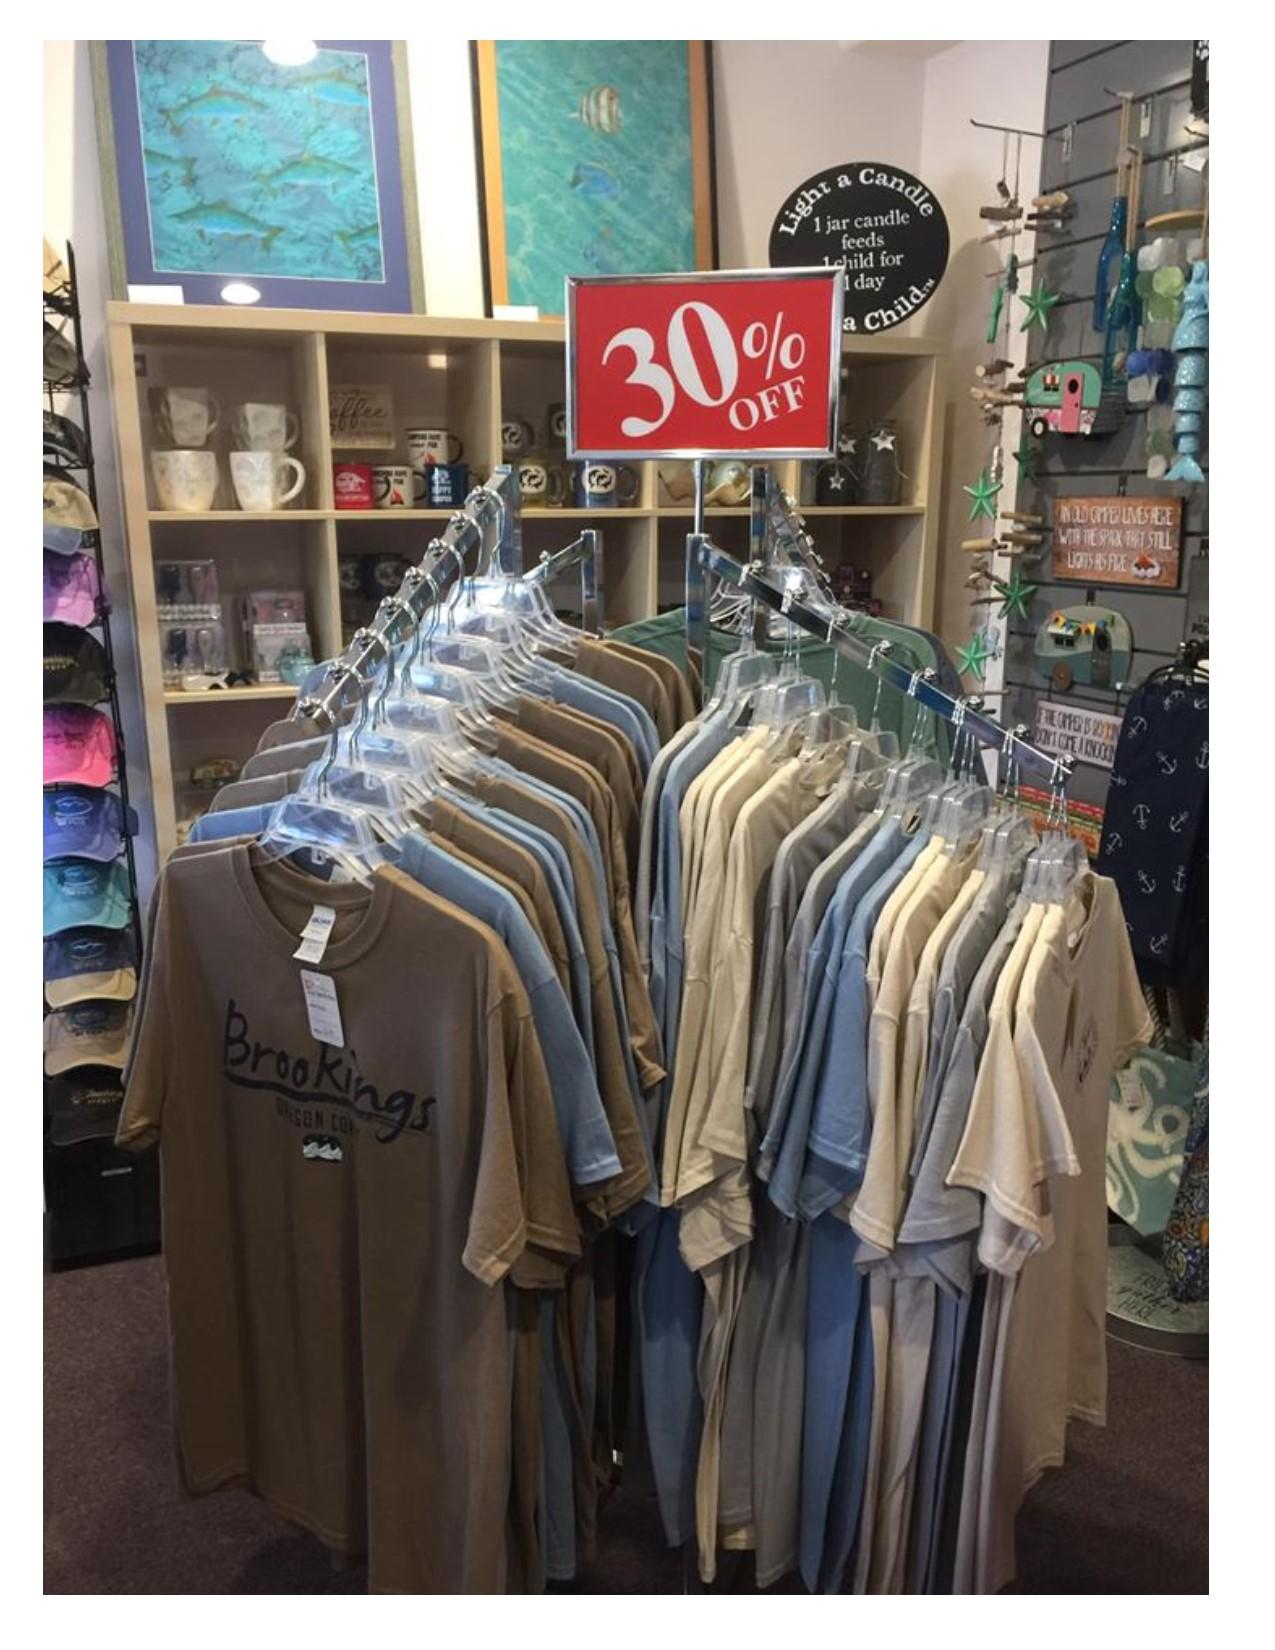 Diftwood Gift Shop tshirts.jpg